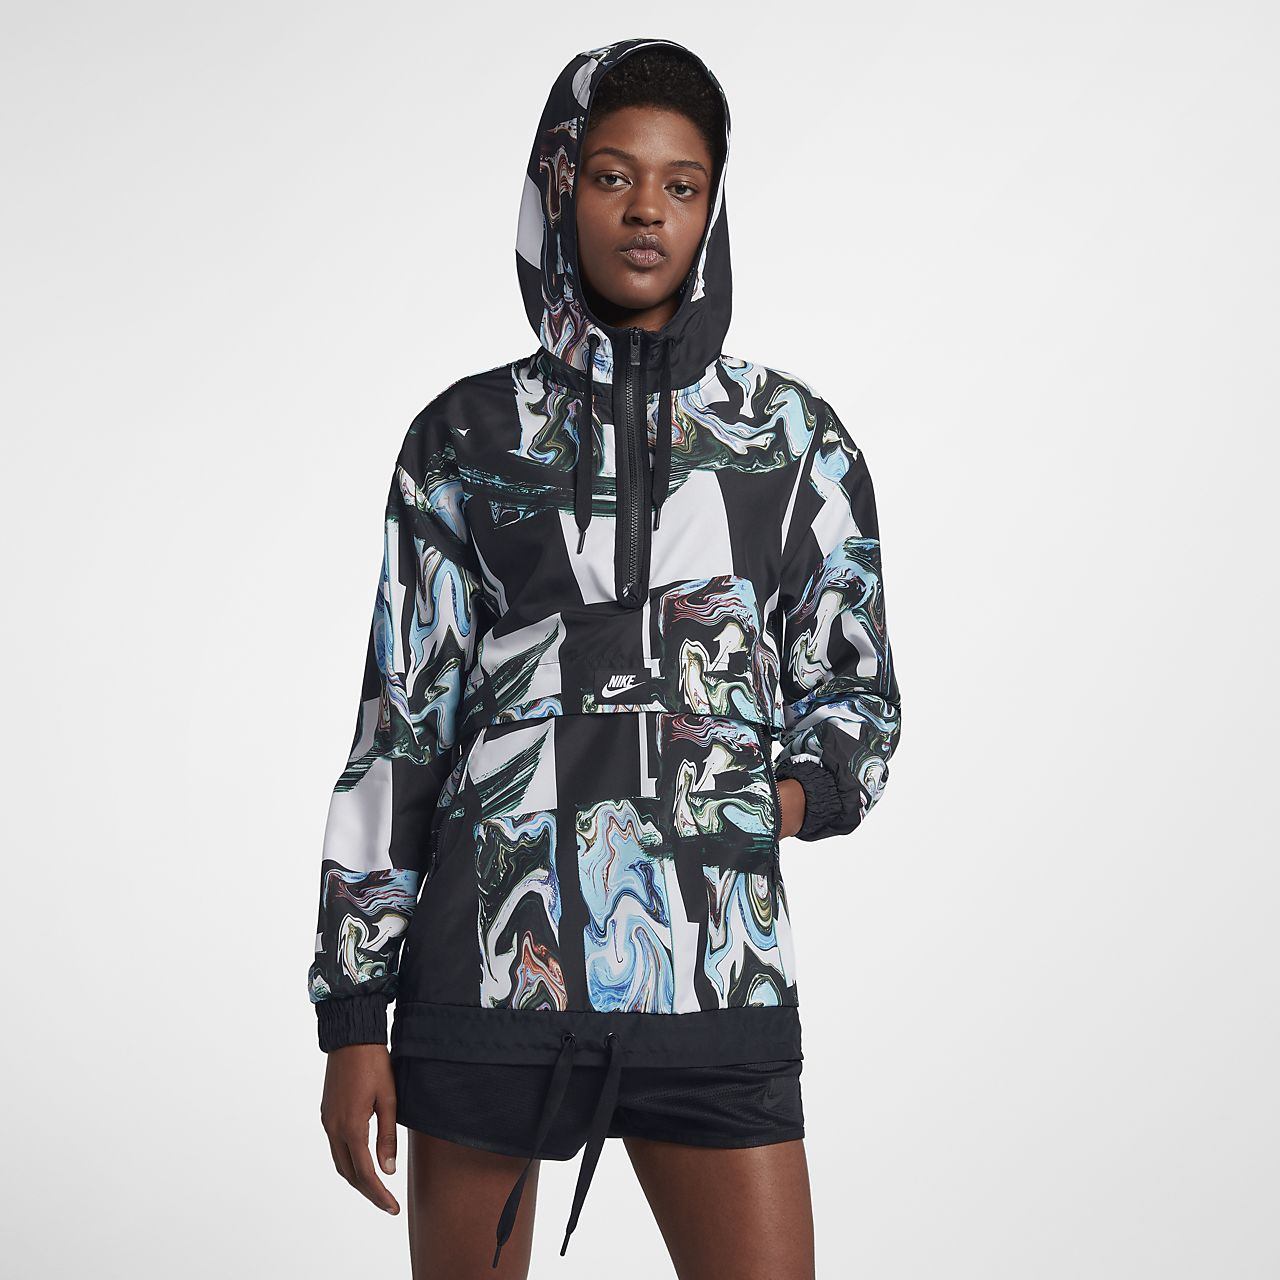 7cc3fad8 Nike Sportswear Women's Printed Jacket. Nike.com MA